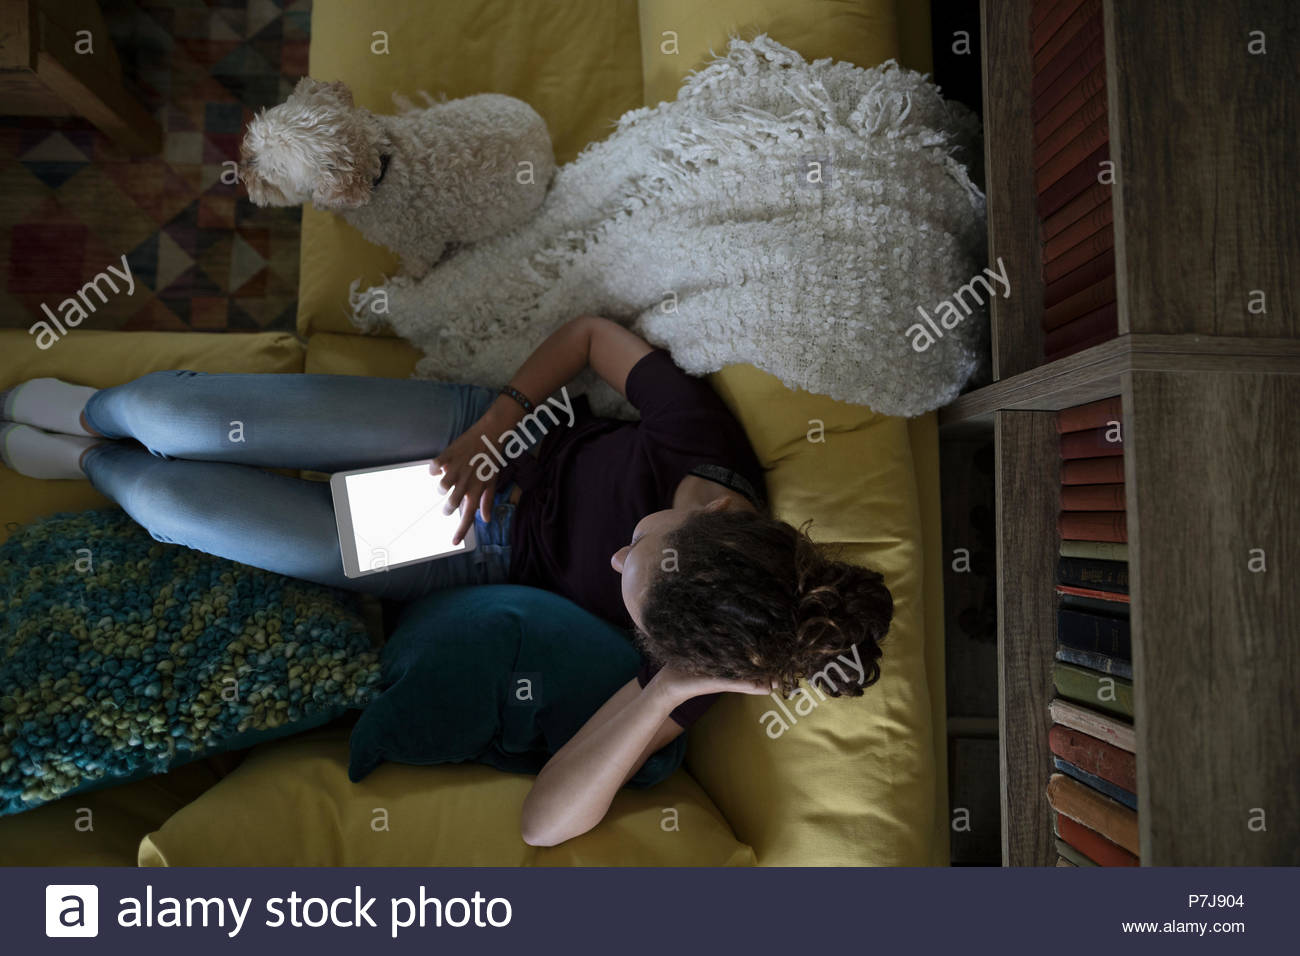 Overhead view tween girl with dog using digital tablet on sofa - Stock Image